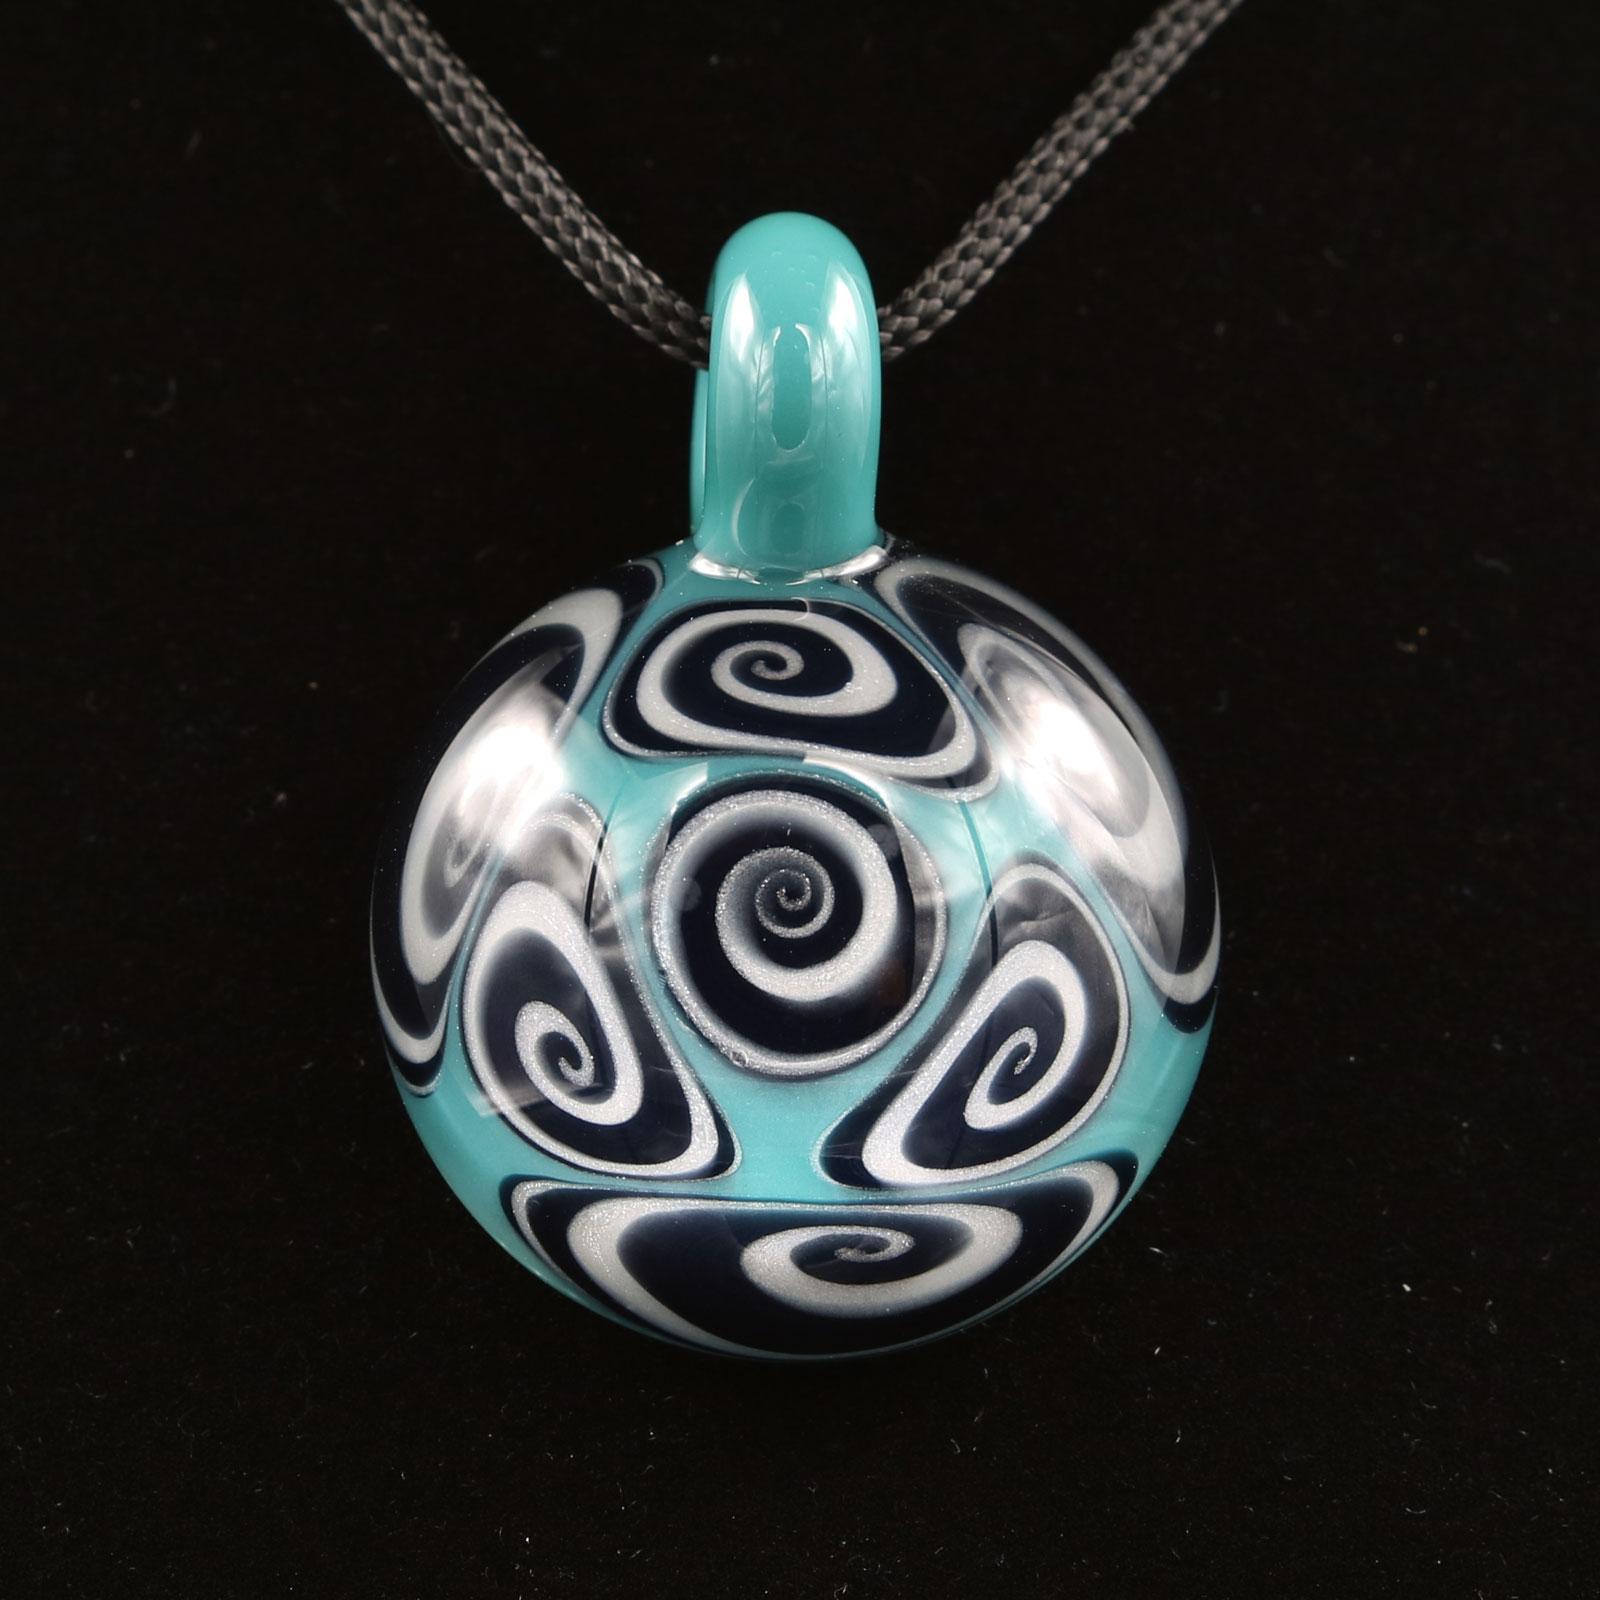 Kaja Glass – 7 Section Opaque Aqua Microspiral Glass Pendant